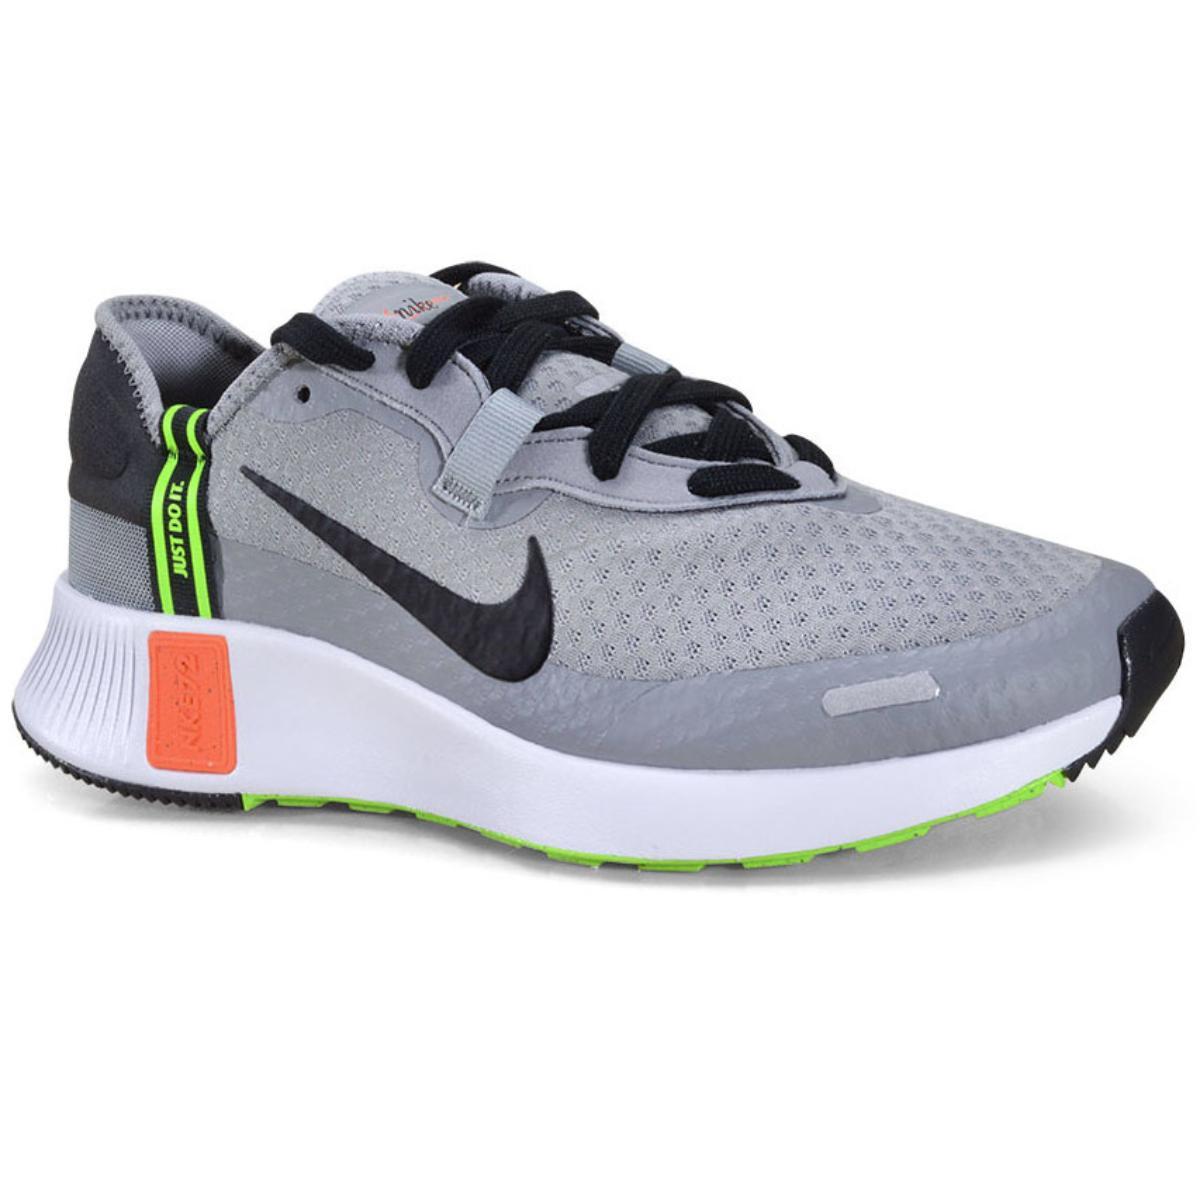 Tênis Masculino Nike Cz5631-014 Reposto Cinza/preto